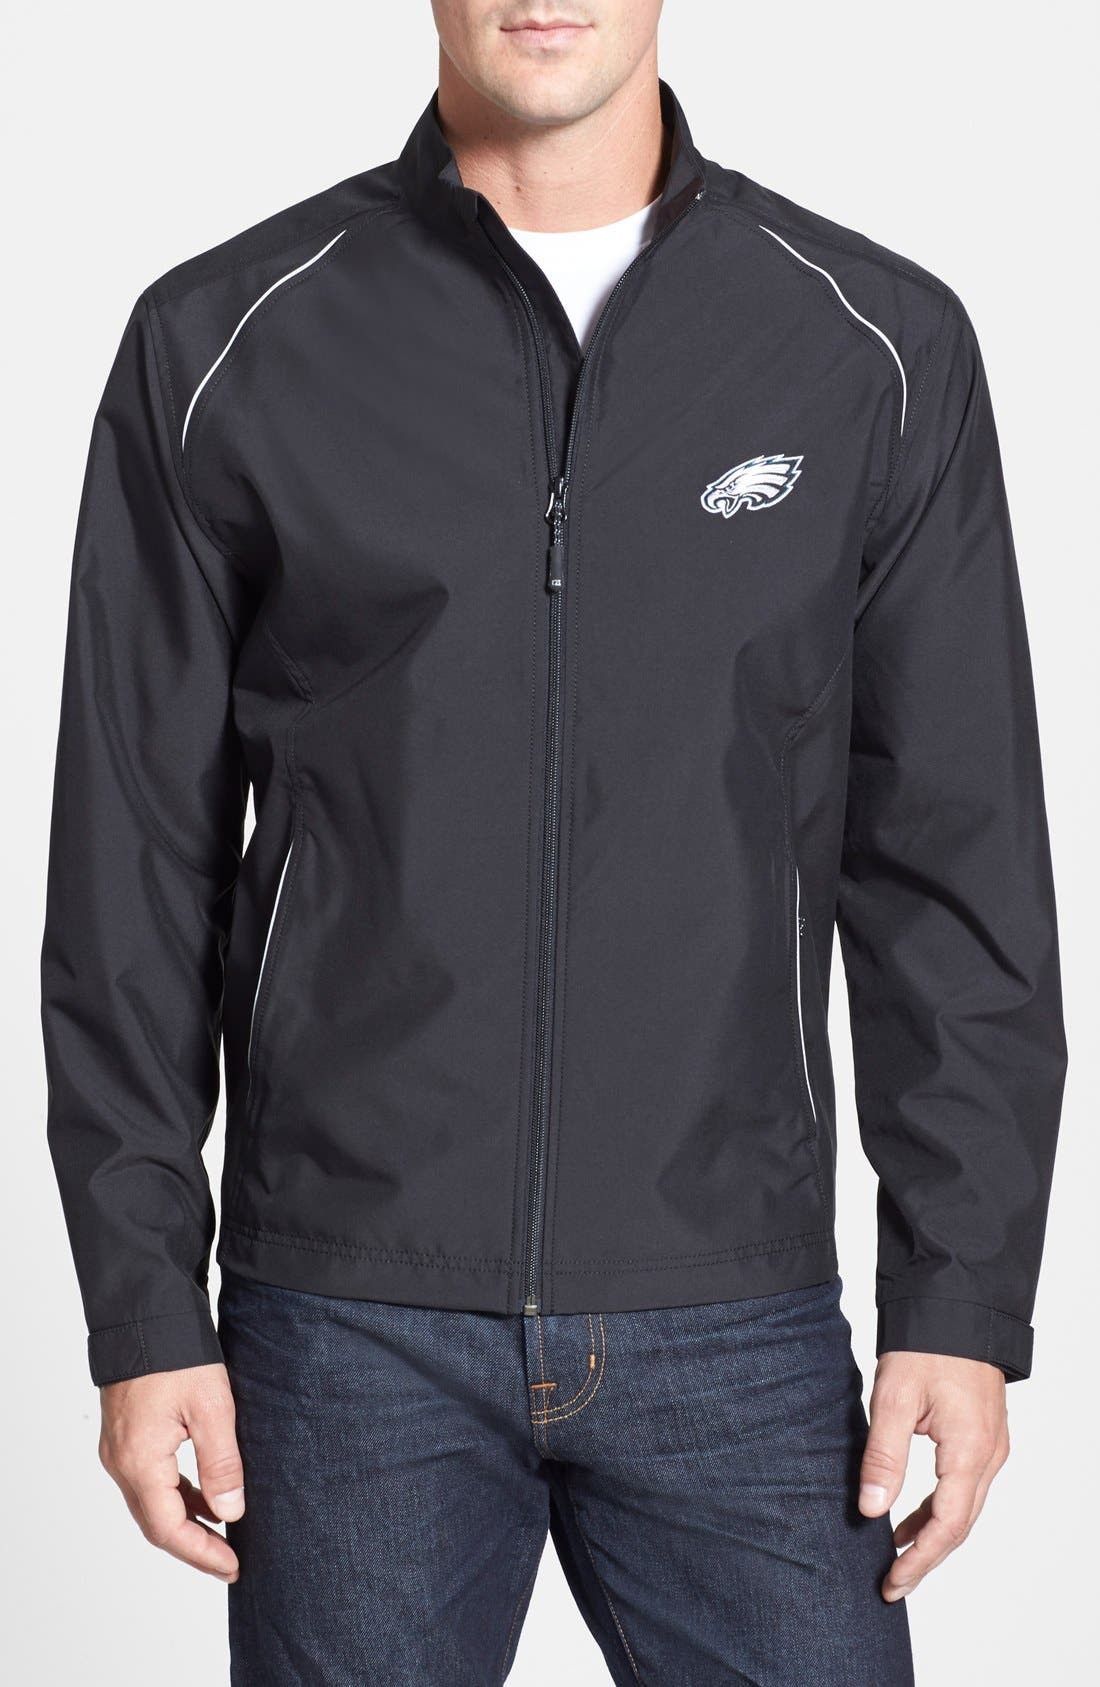 Main Image - Cutter & Buck Philadelphia Eagles - Beacon WeatherTec Wind & Water Resistant Jacket